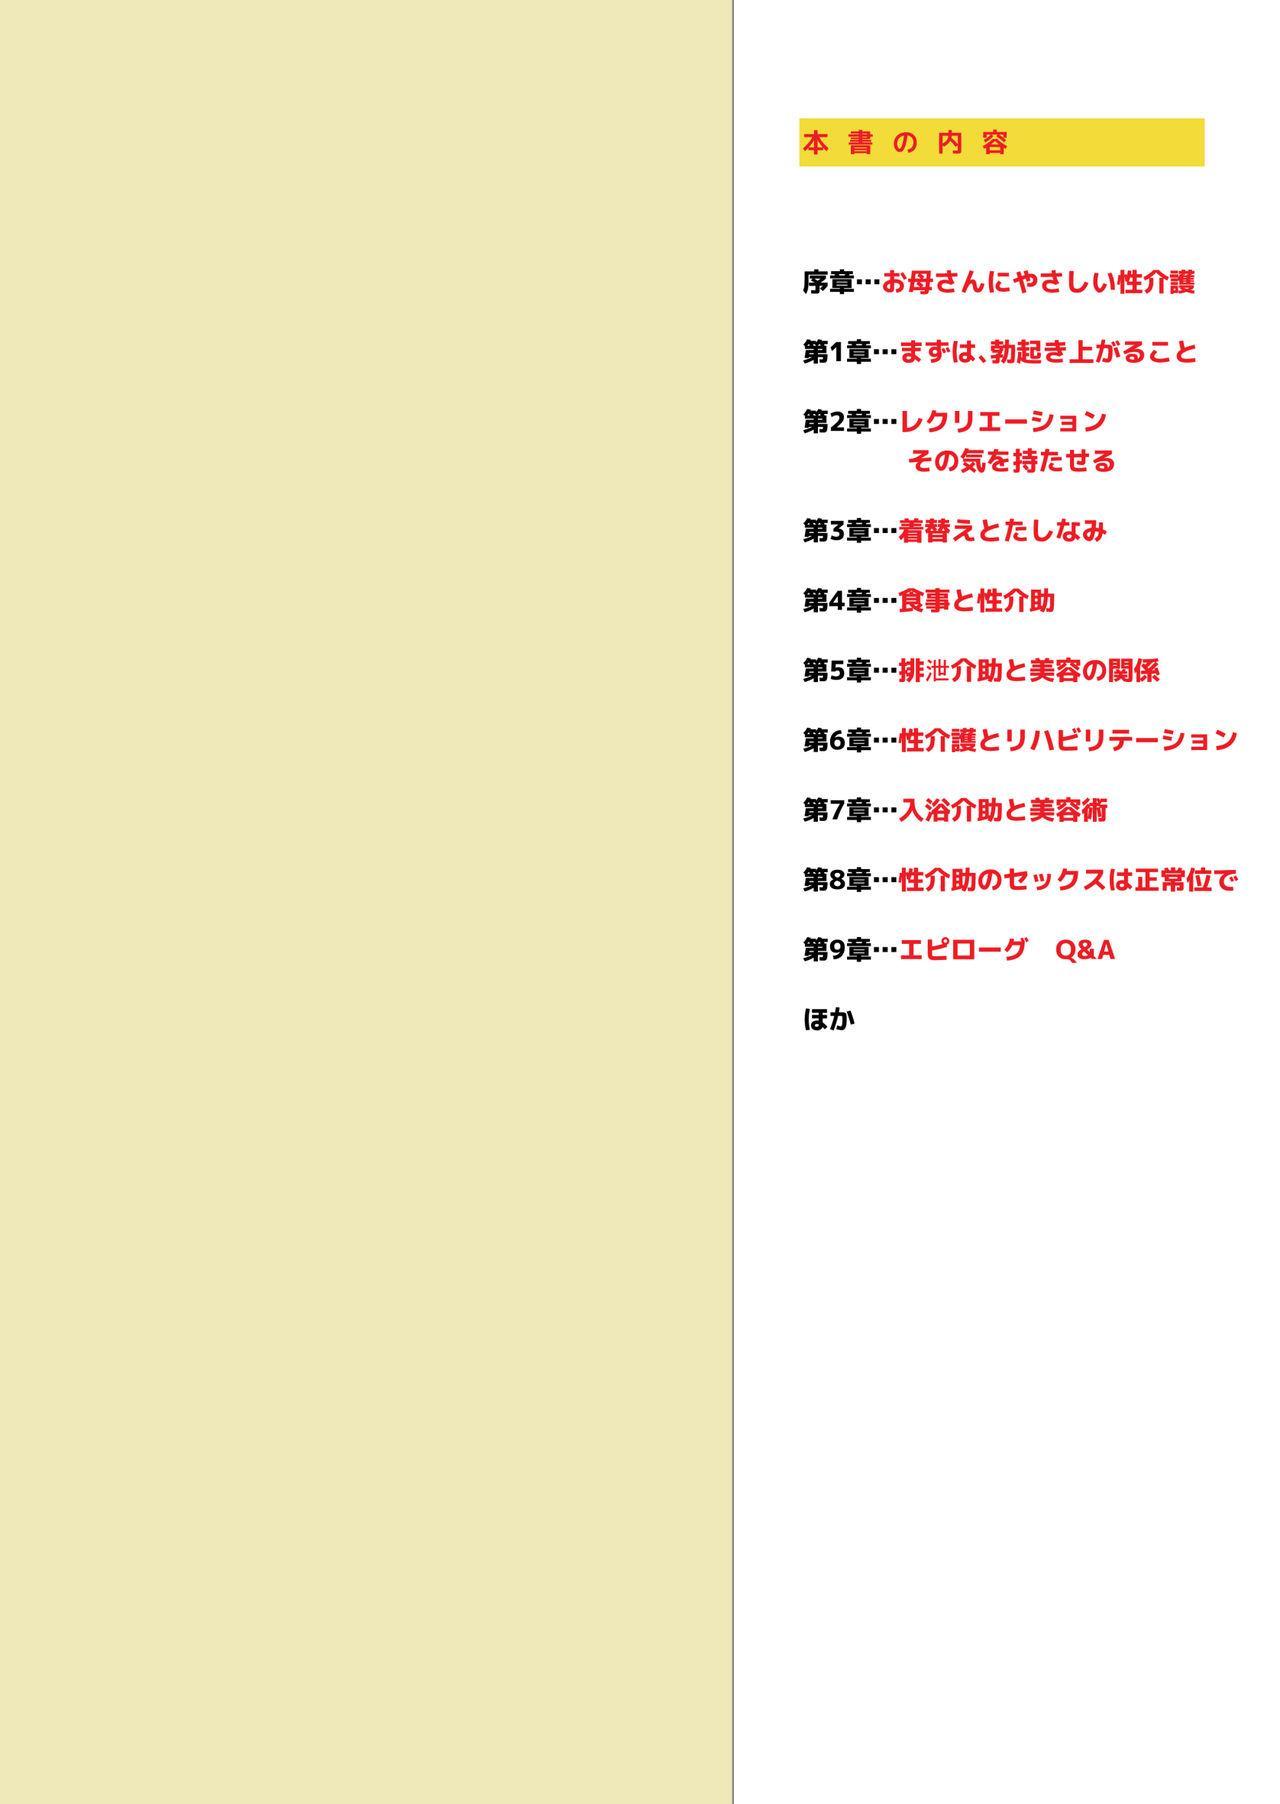 Isogasii Okaasan No Tamuno Sasa Rouzin Seikaigo | Guide for Elderly Sex Health Care to Busy Mom 1